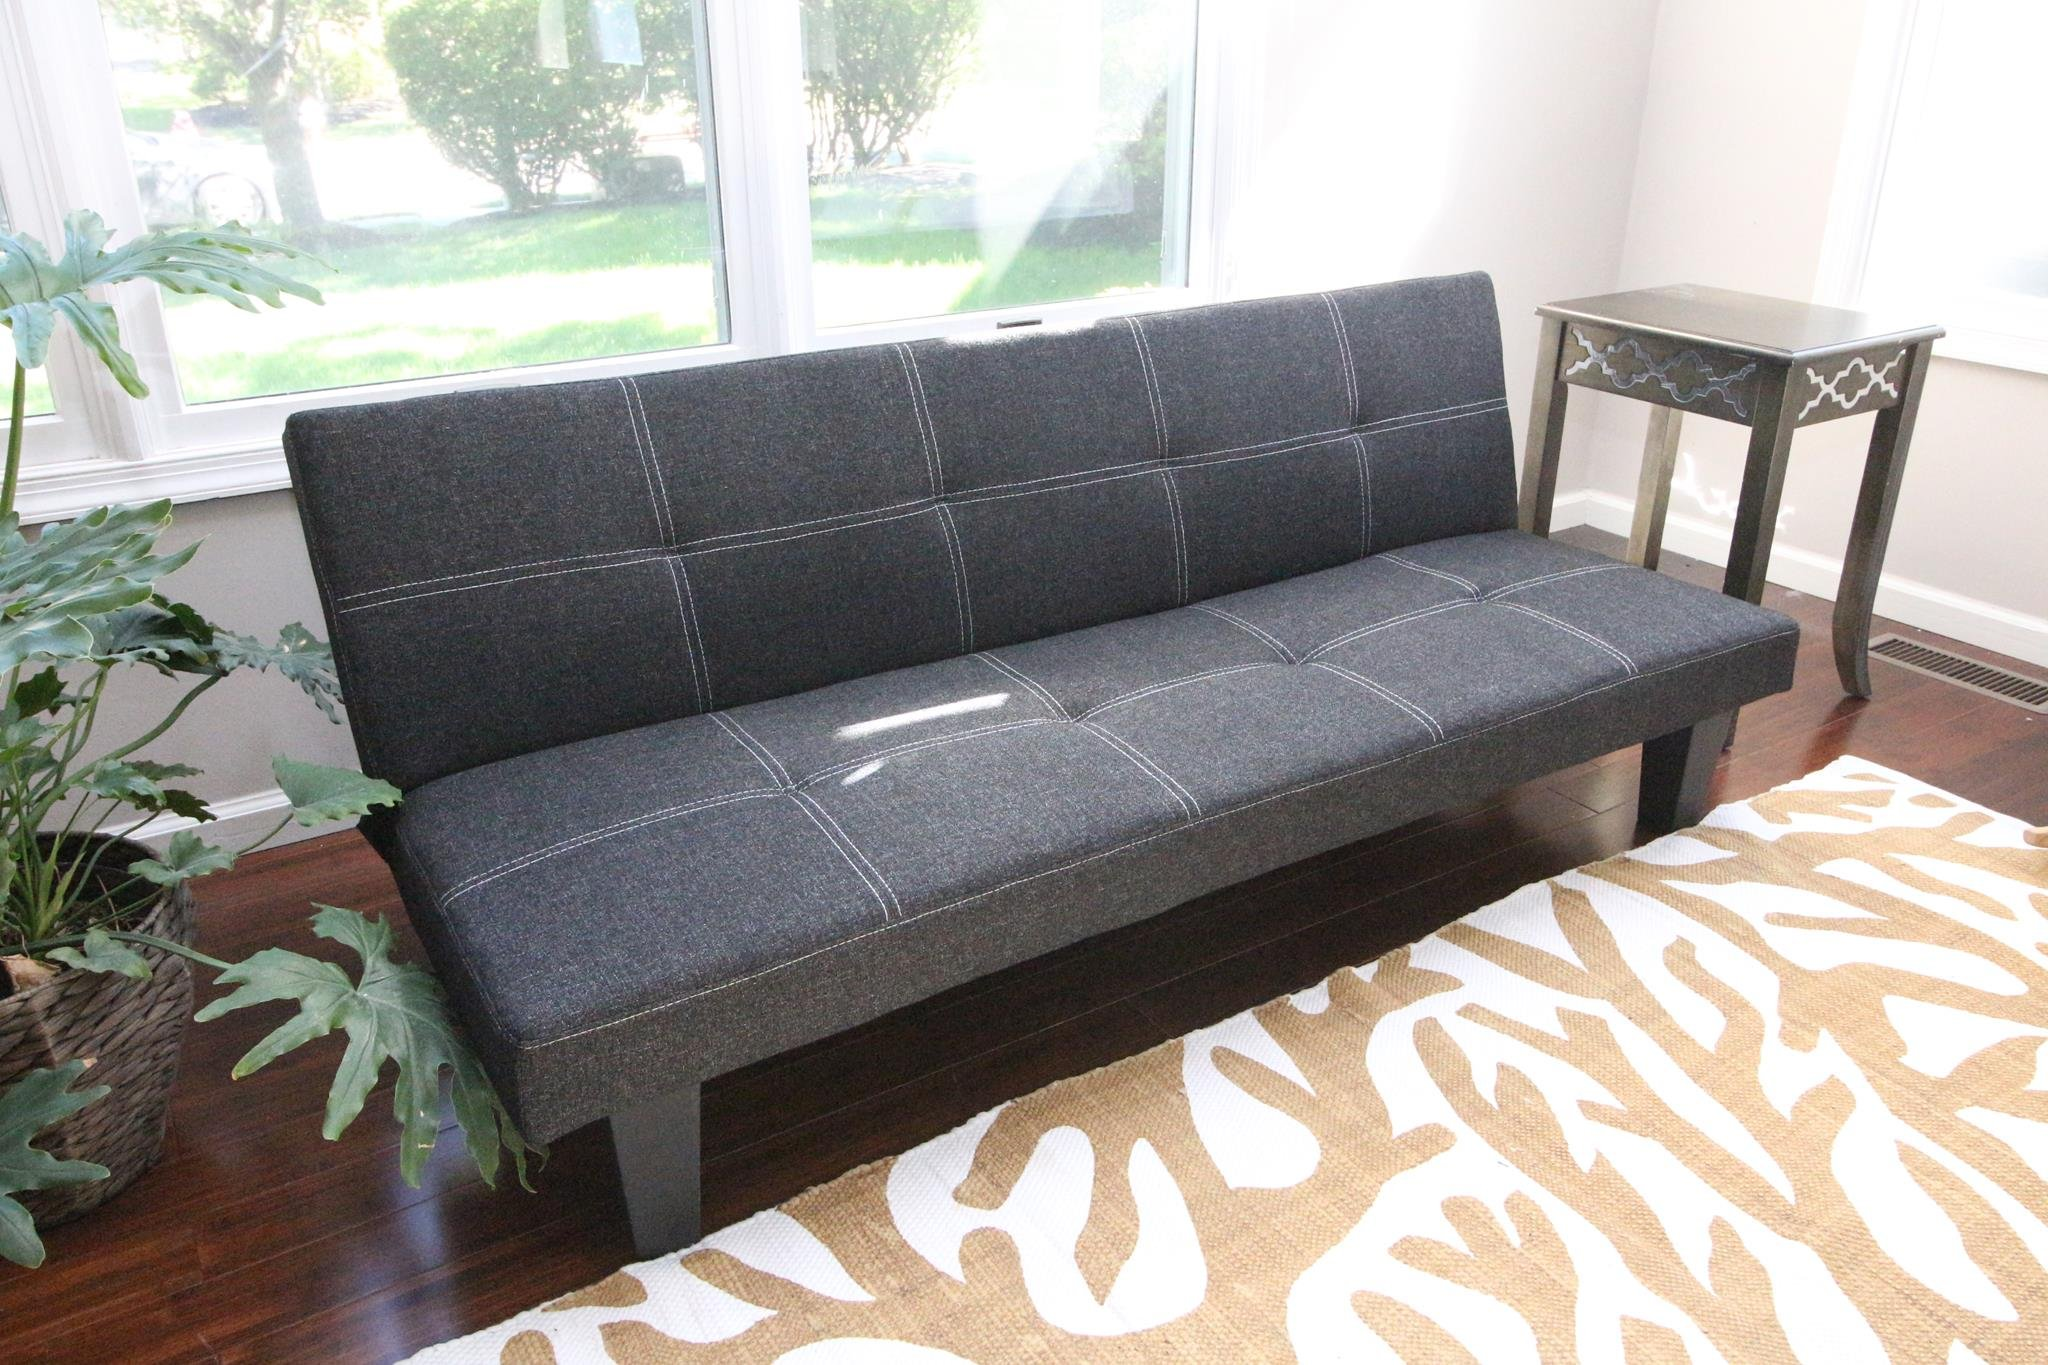 Home Life Andrew Grey Linen with Adjustable Back Klik Klak Sofa Futon Bed Sleeper Convertible